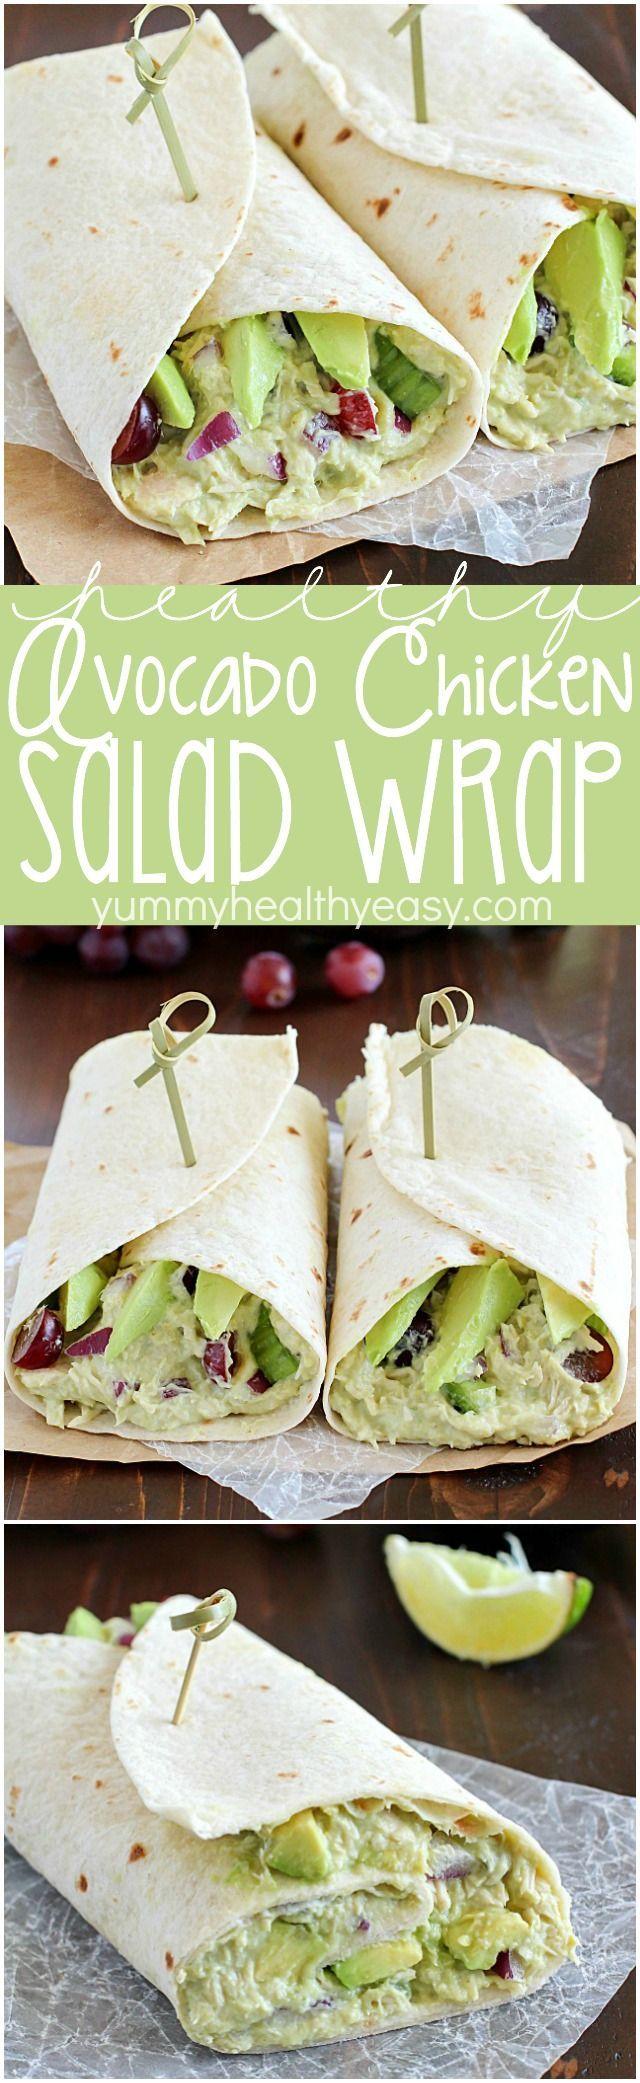 Avocado Chicken Salad Wrap - a perfect blend of avocado, Greek yogurt, chicken, celery, grapes, red onion